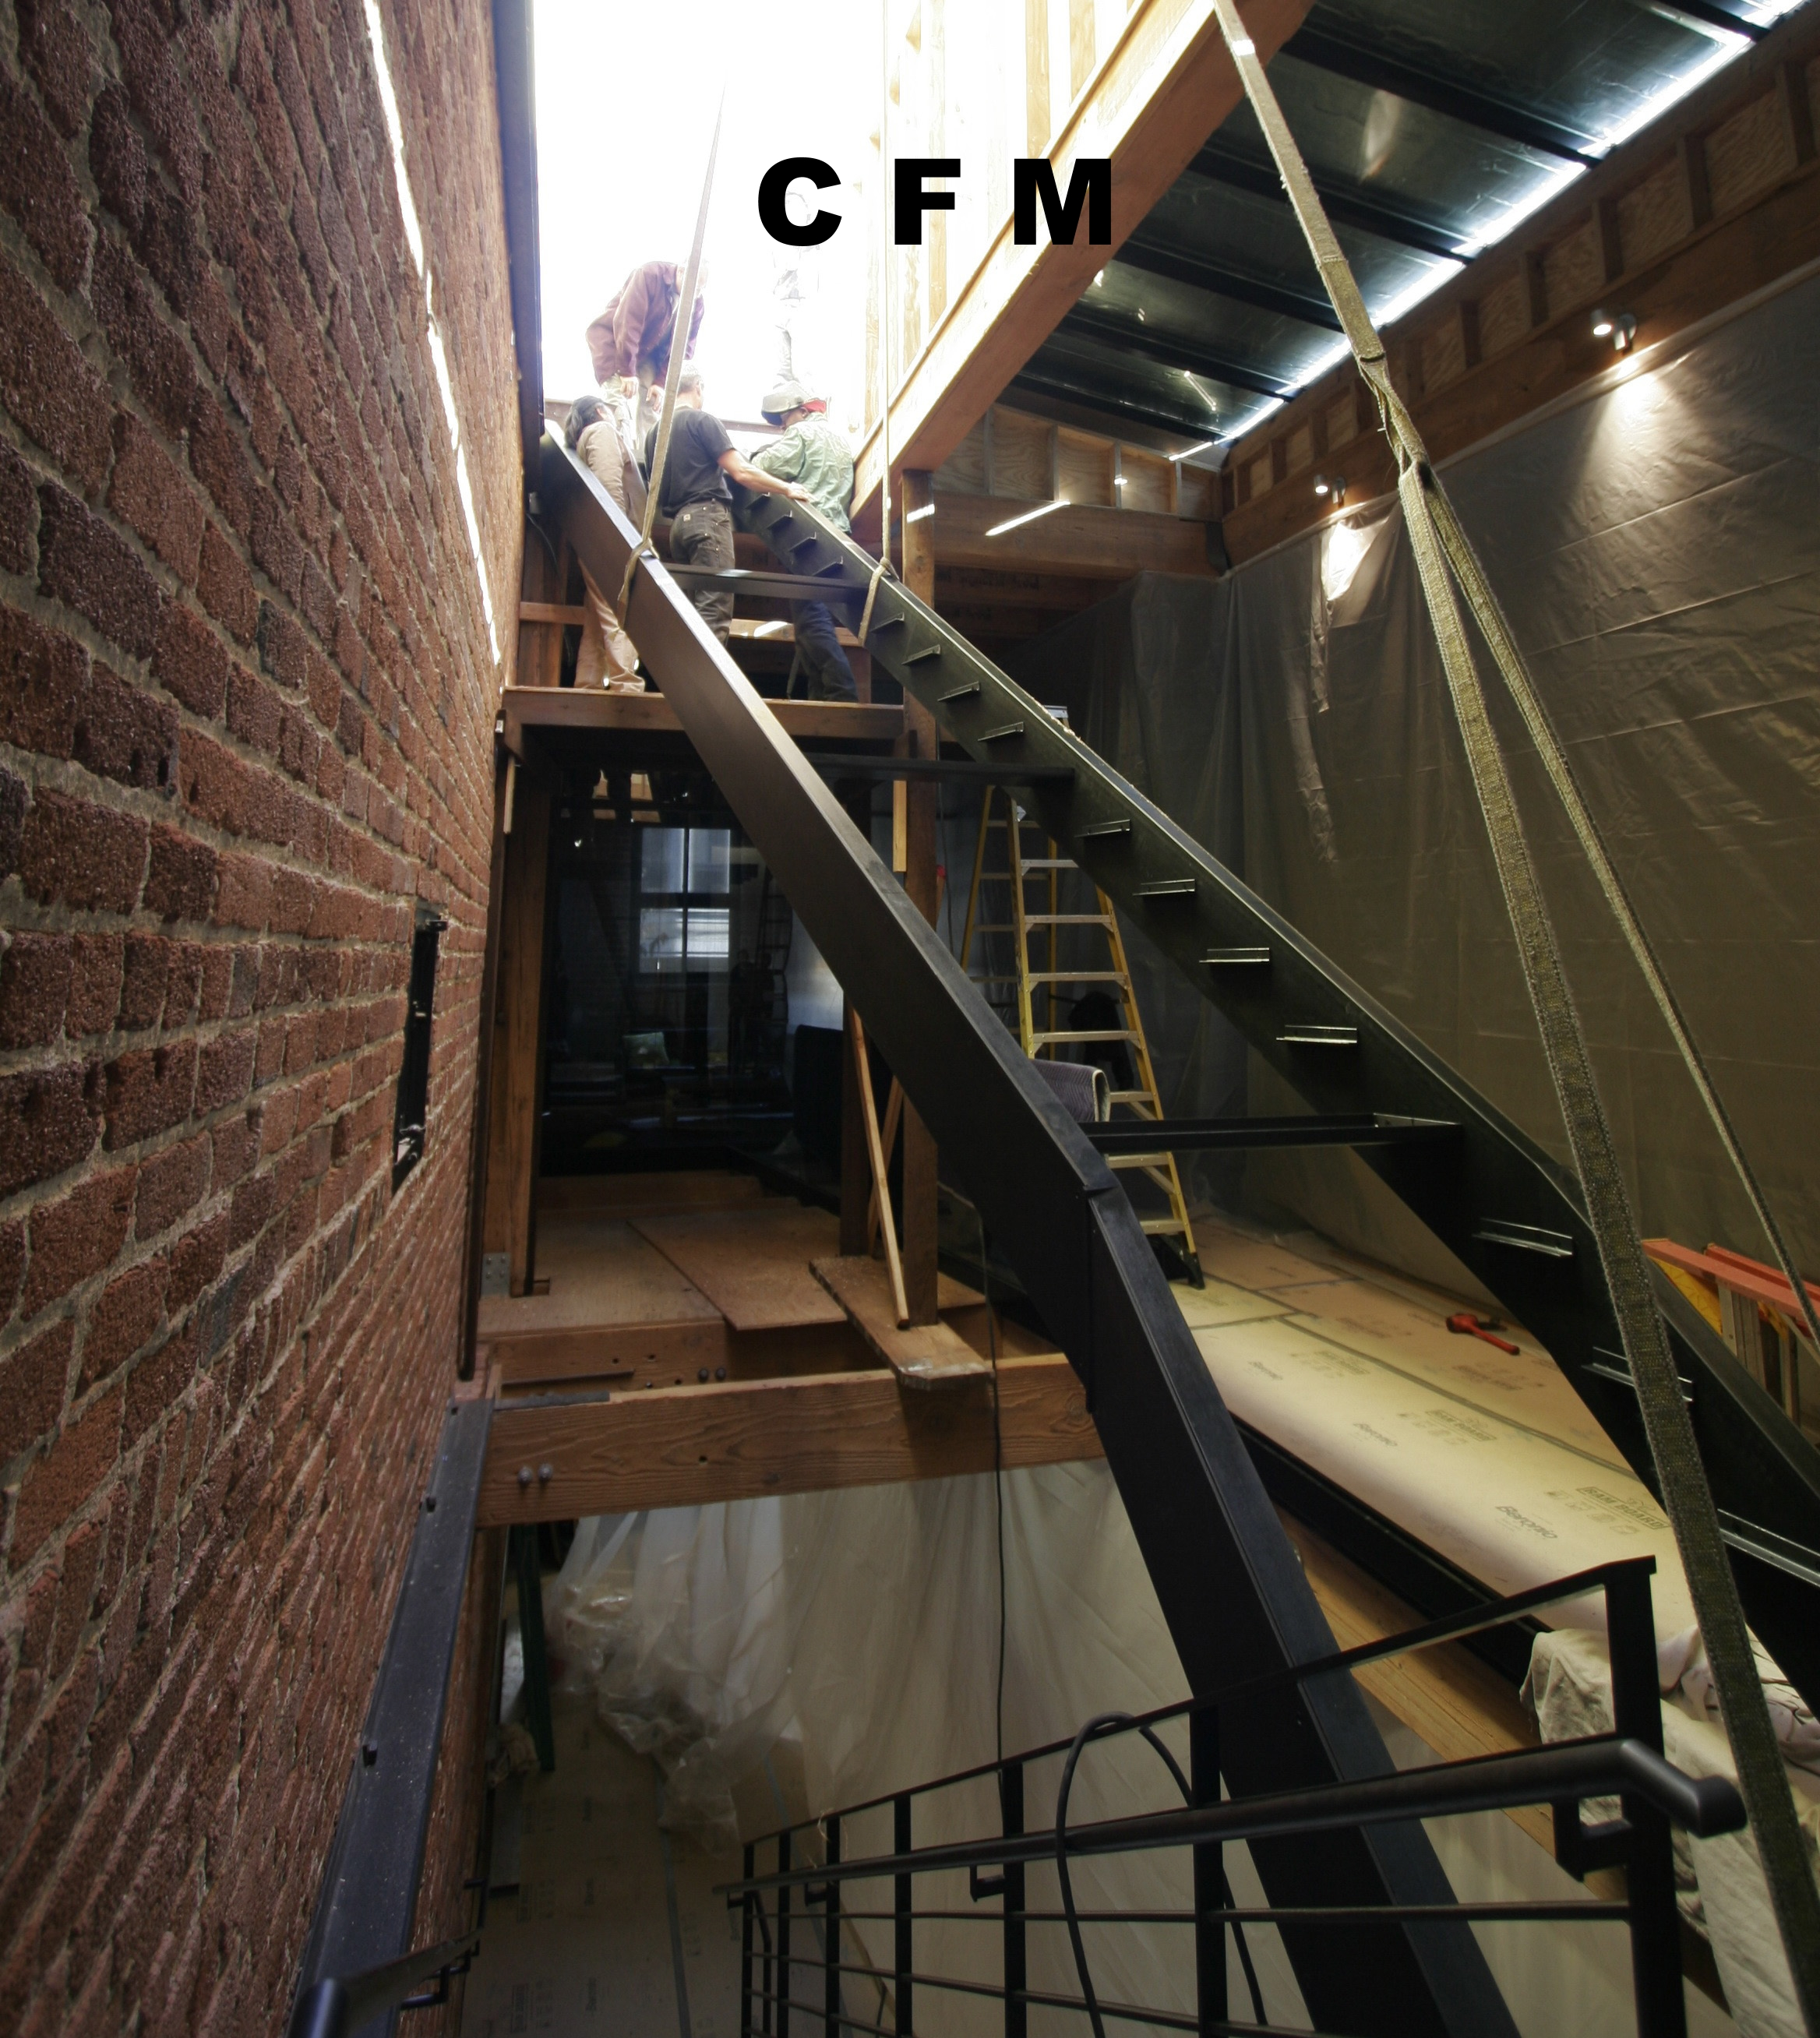 CHRIS FRENCH METAL [CFM]: Jan 2010 - September 2012